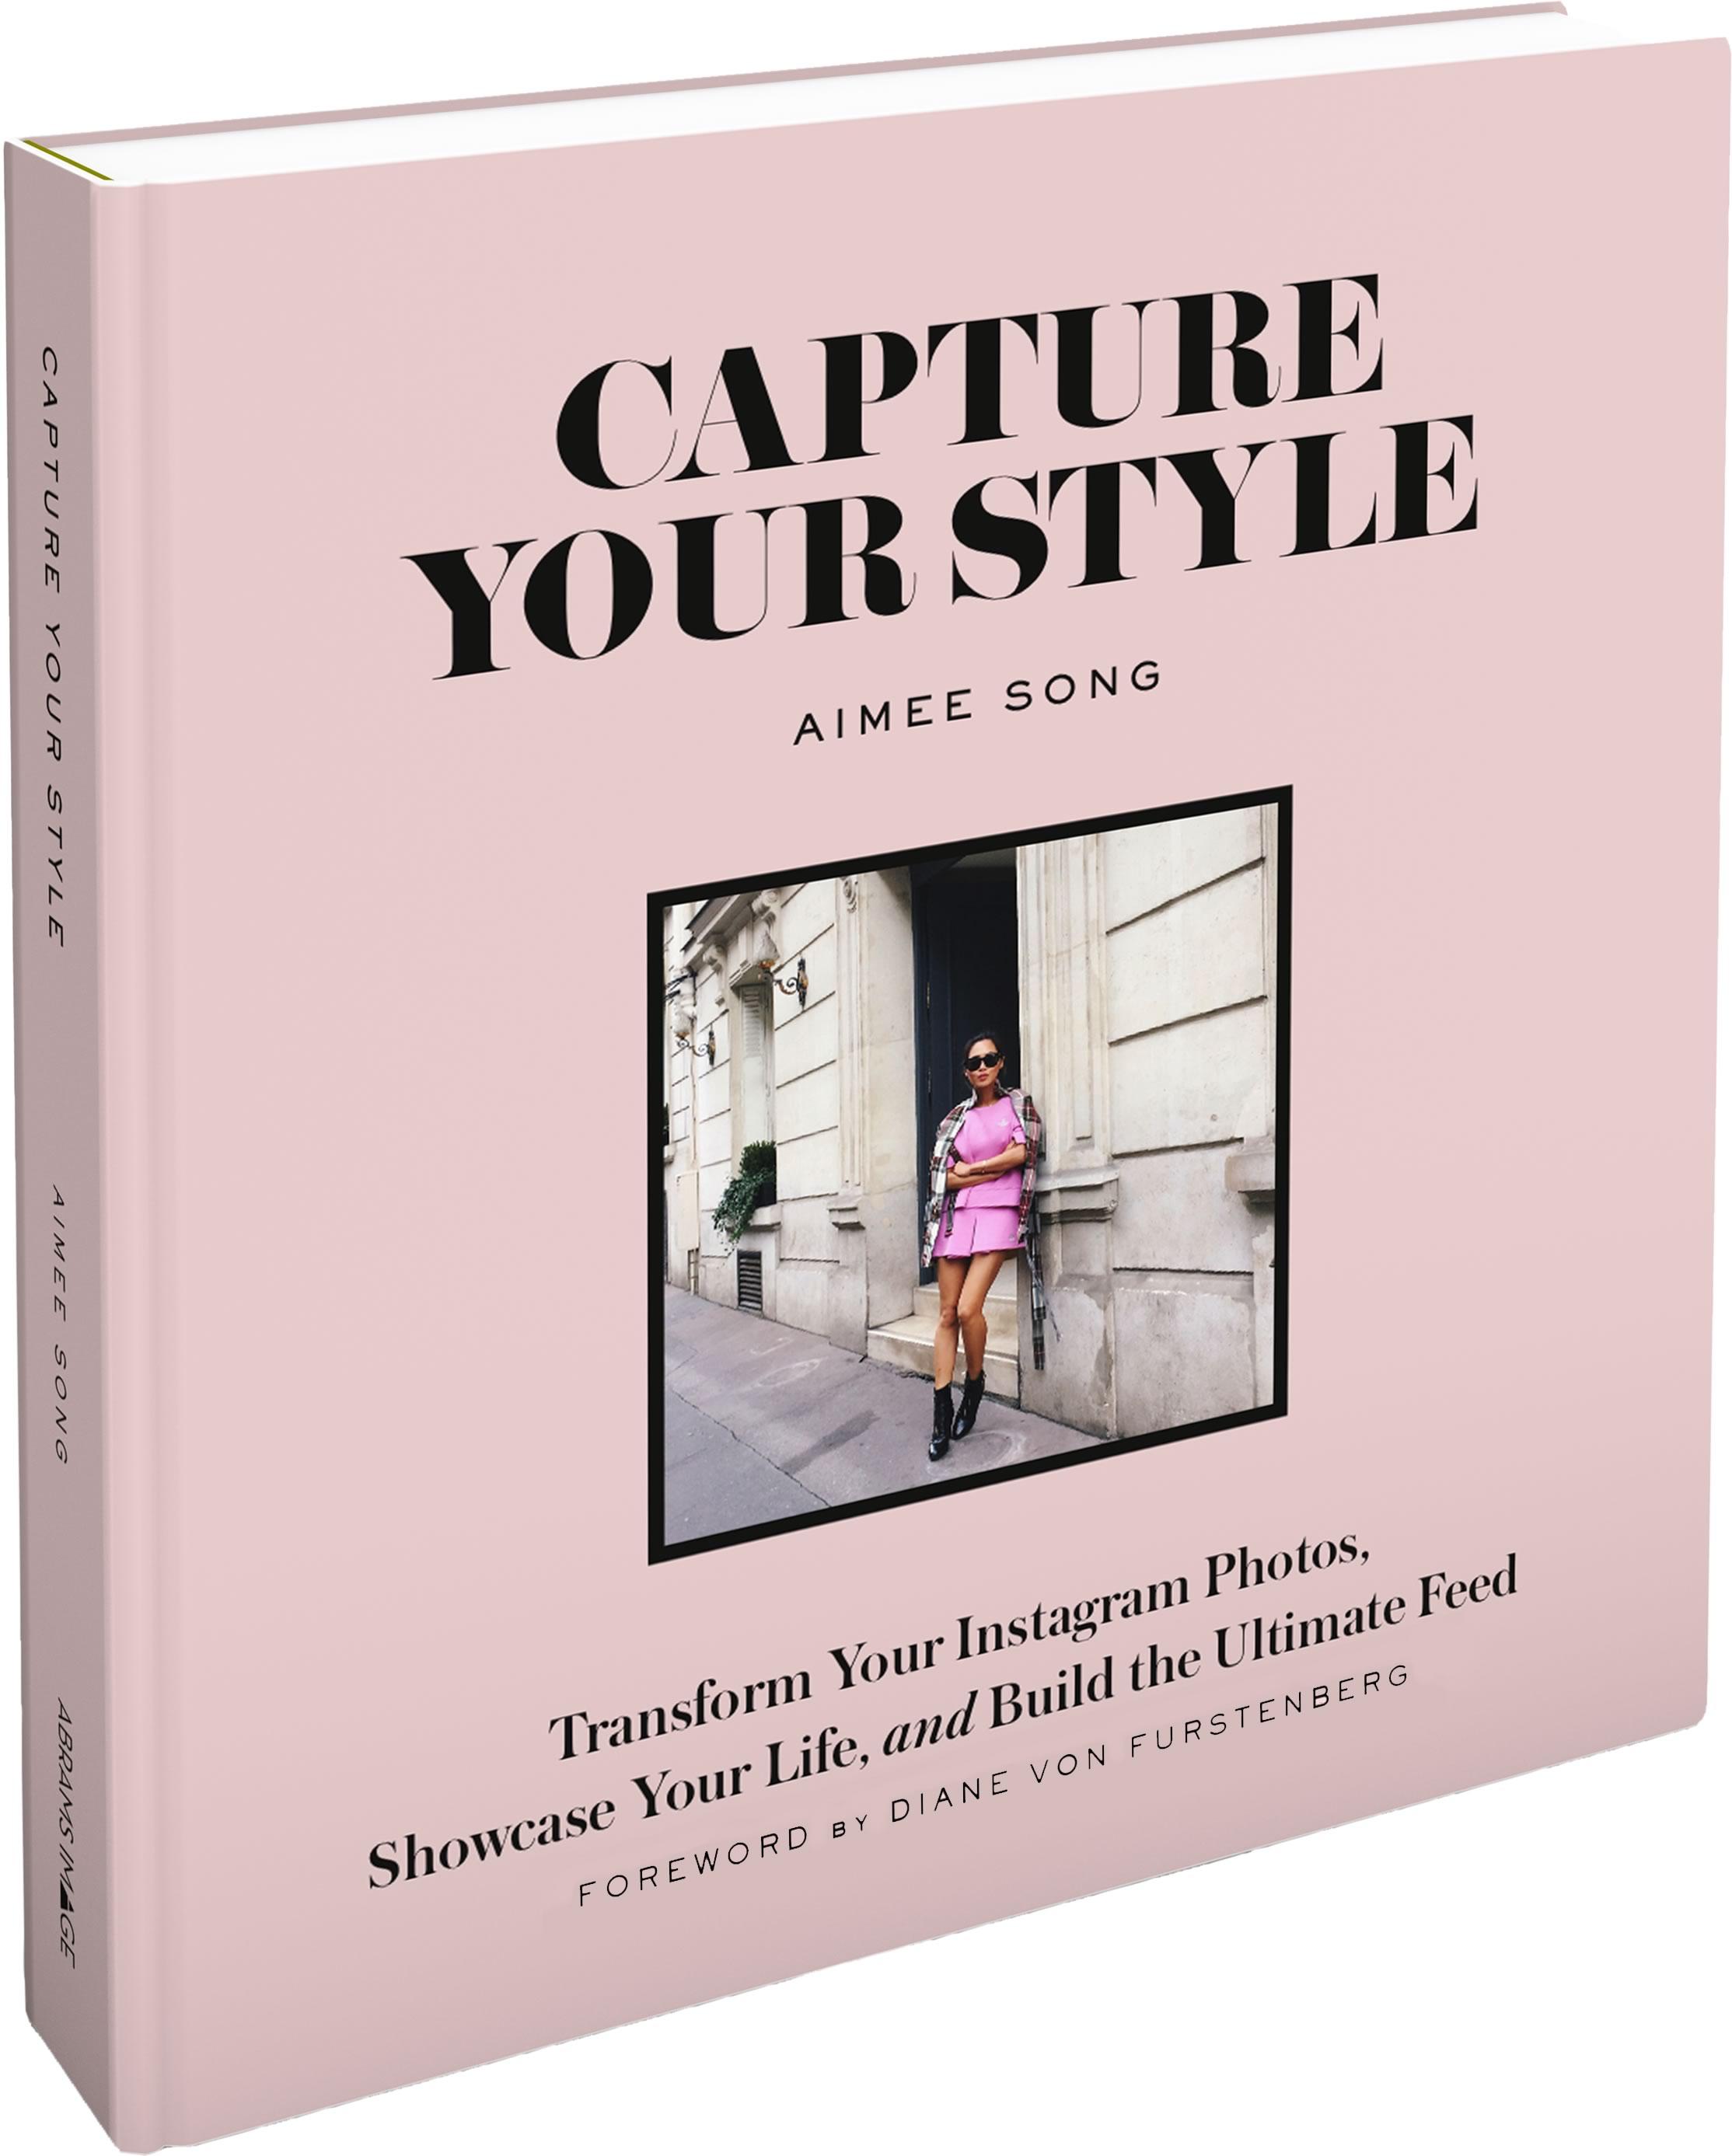 captureyourstyle_book